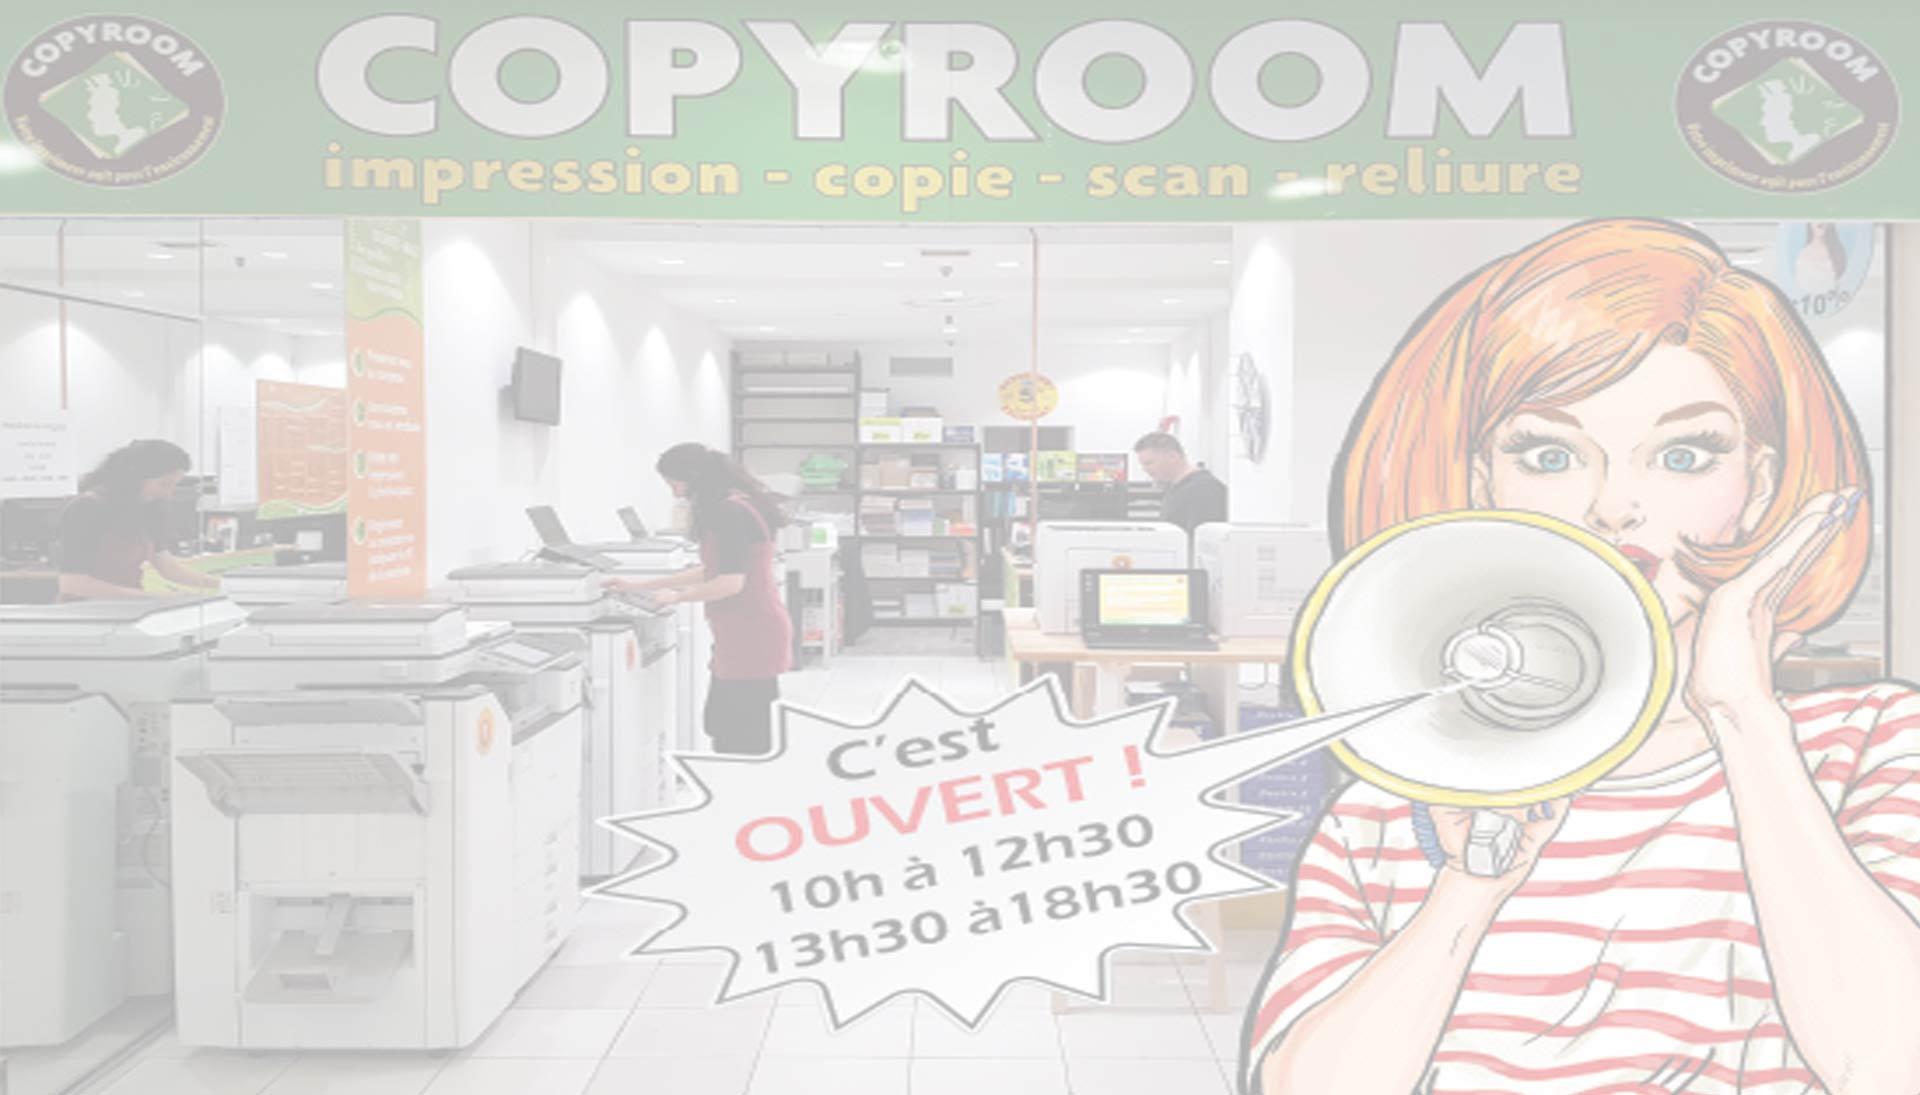 Bienvenue à Copyroom 3 Soleils !